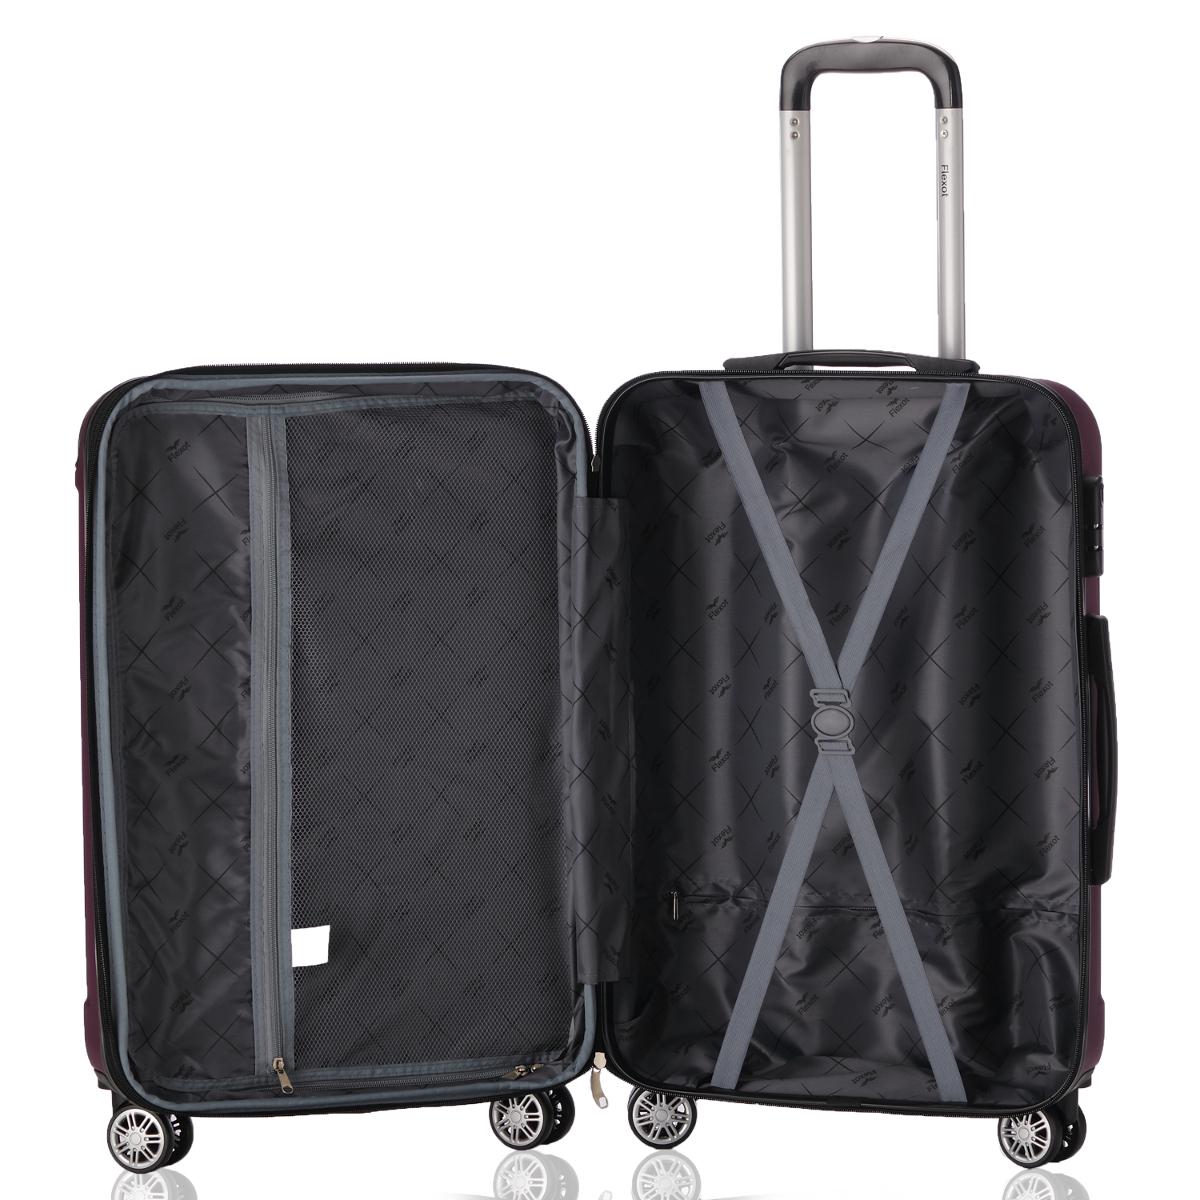 Koffer-Flexot-2045-Hartschalenkoffer-Trolley-Kofferset-Reisekoffer-M-L-XL-Set Indexbild 89